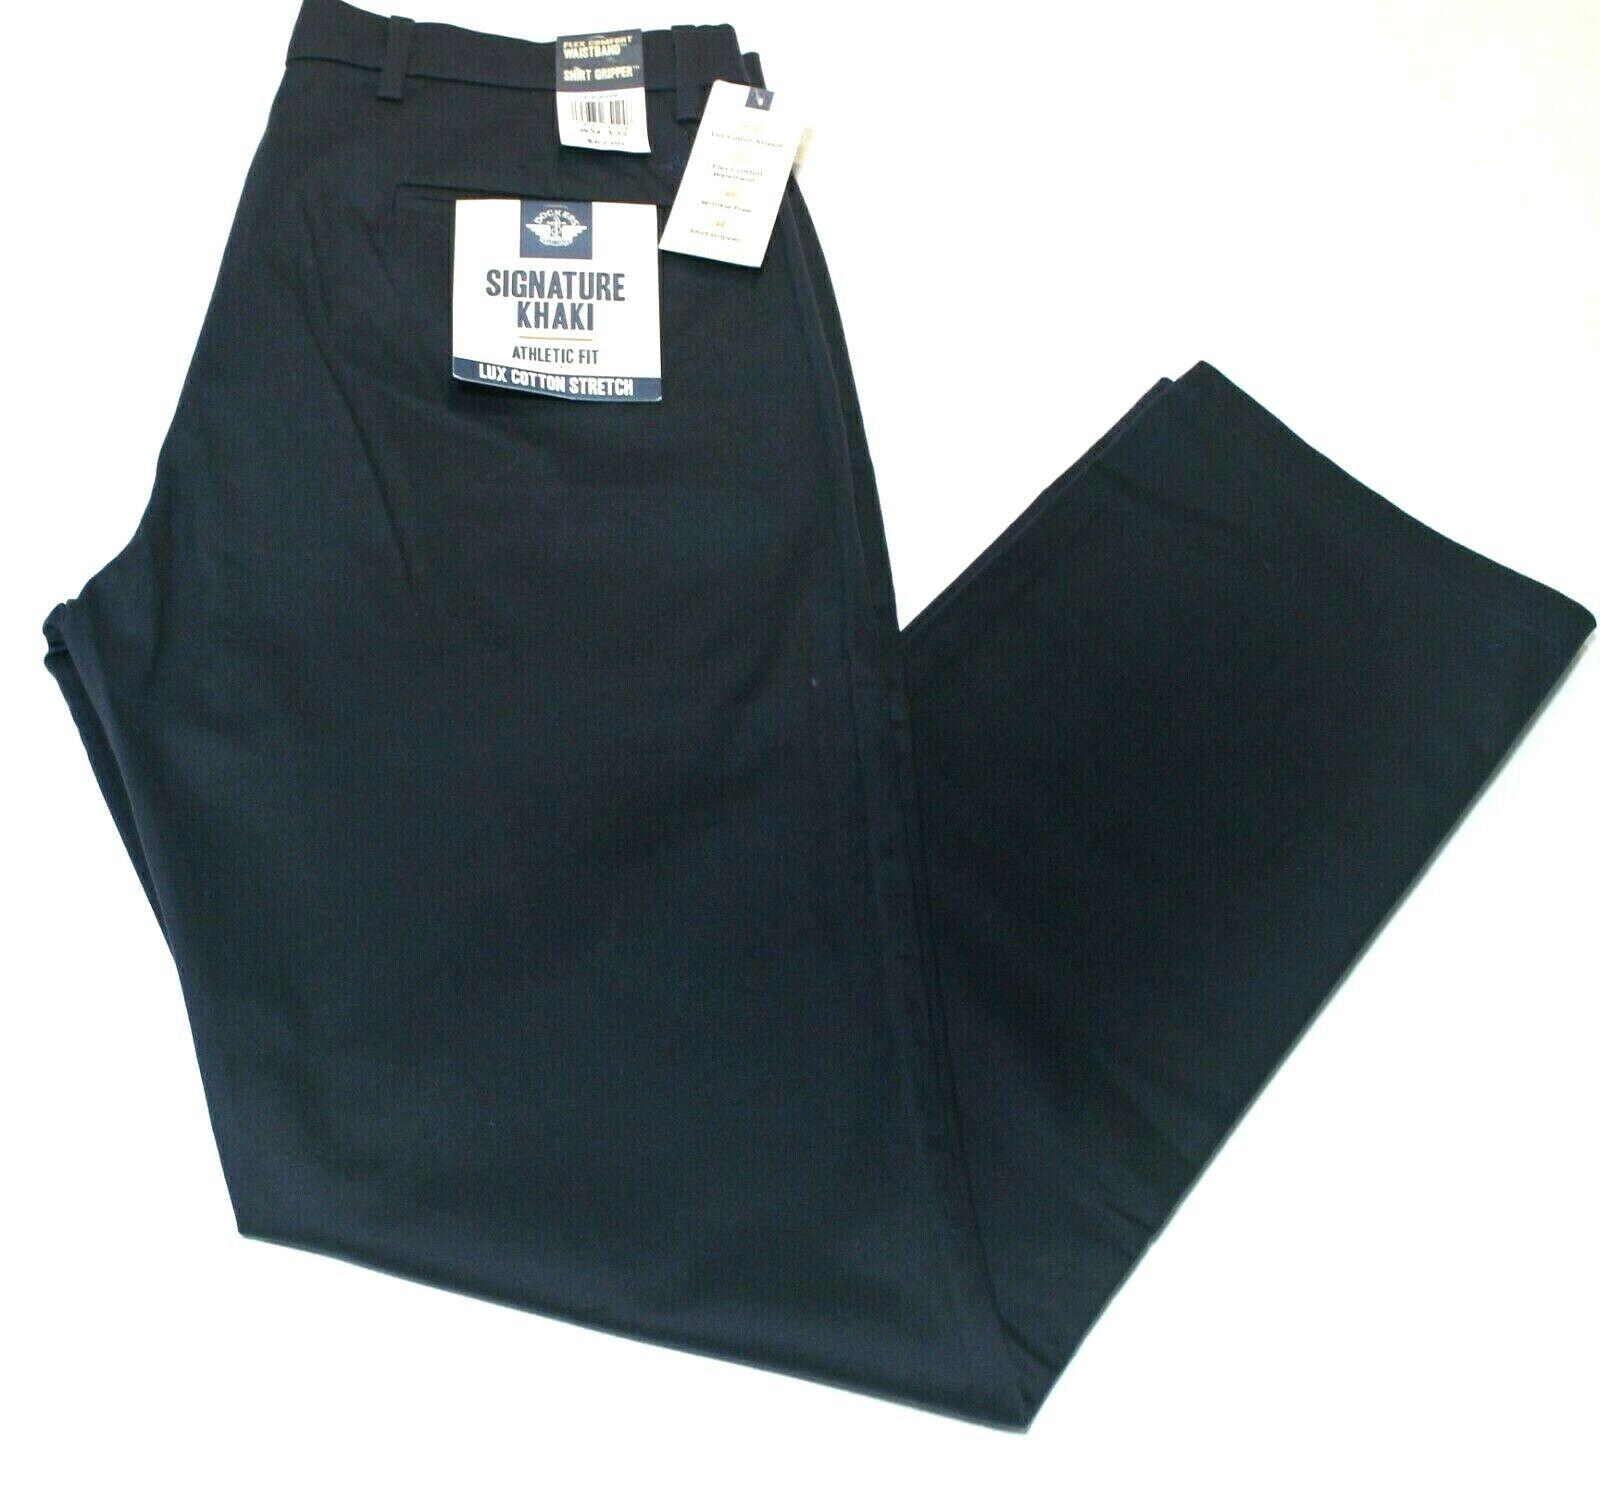 Men Navy Blue Dockers Signature Khaki Athletic Fit Flex Comf